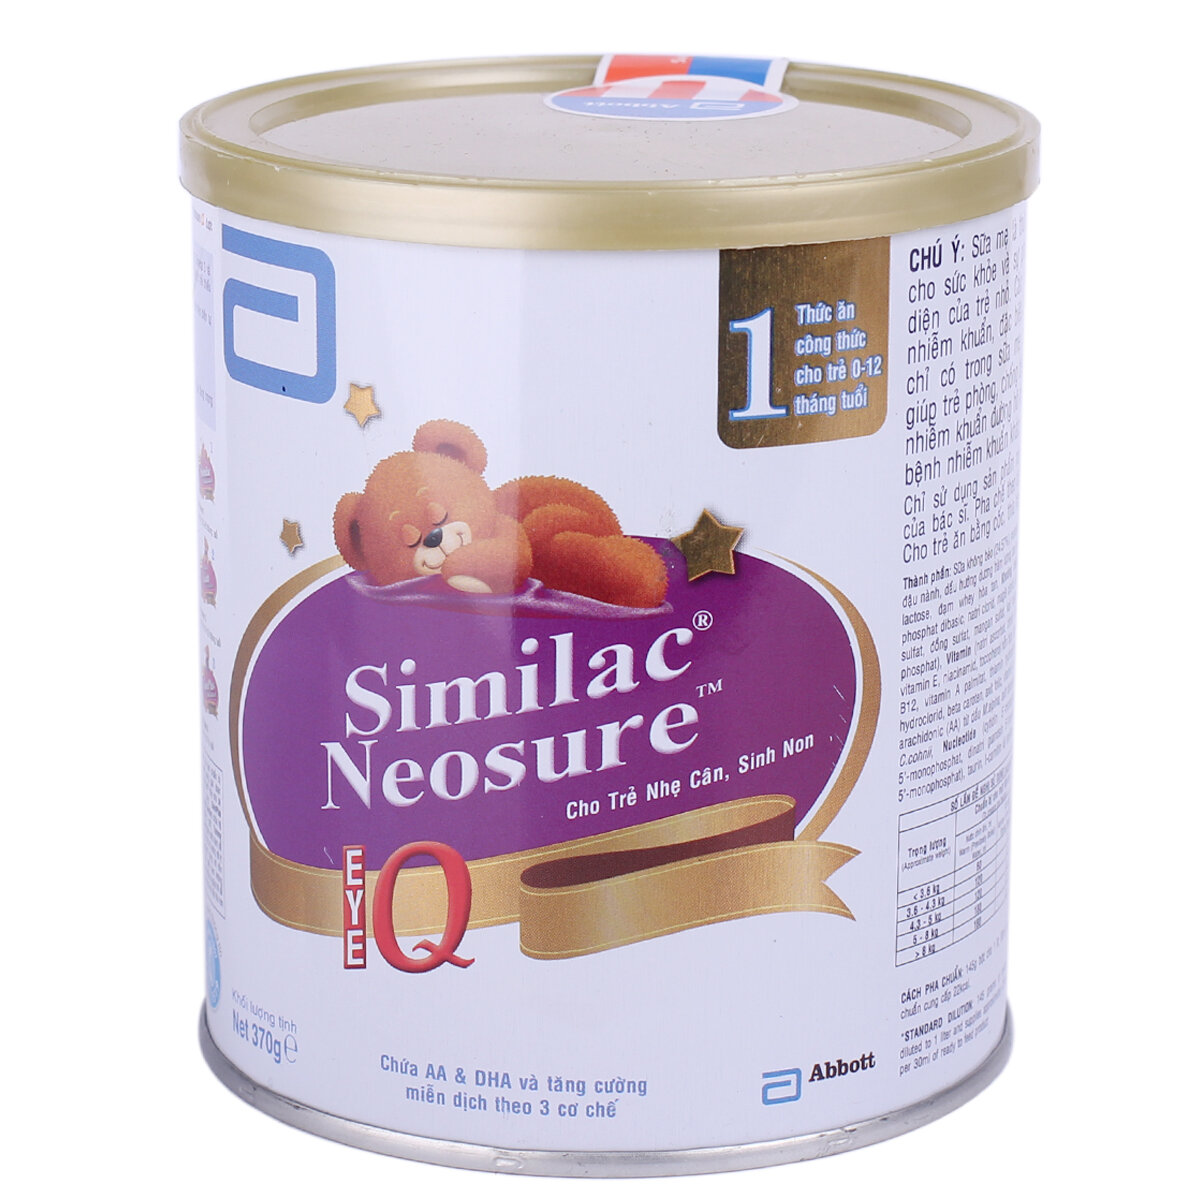 Sữa bột Similac Neosure